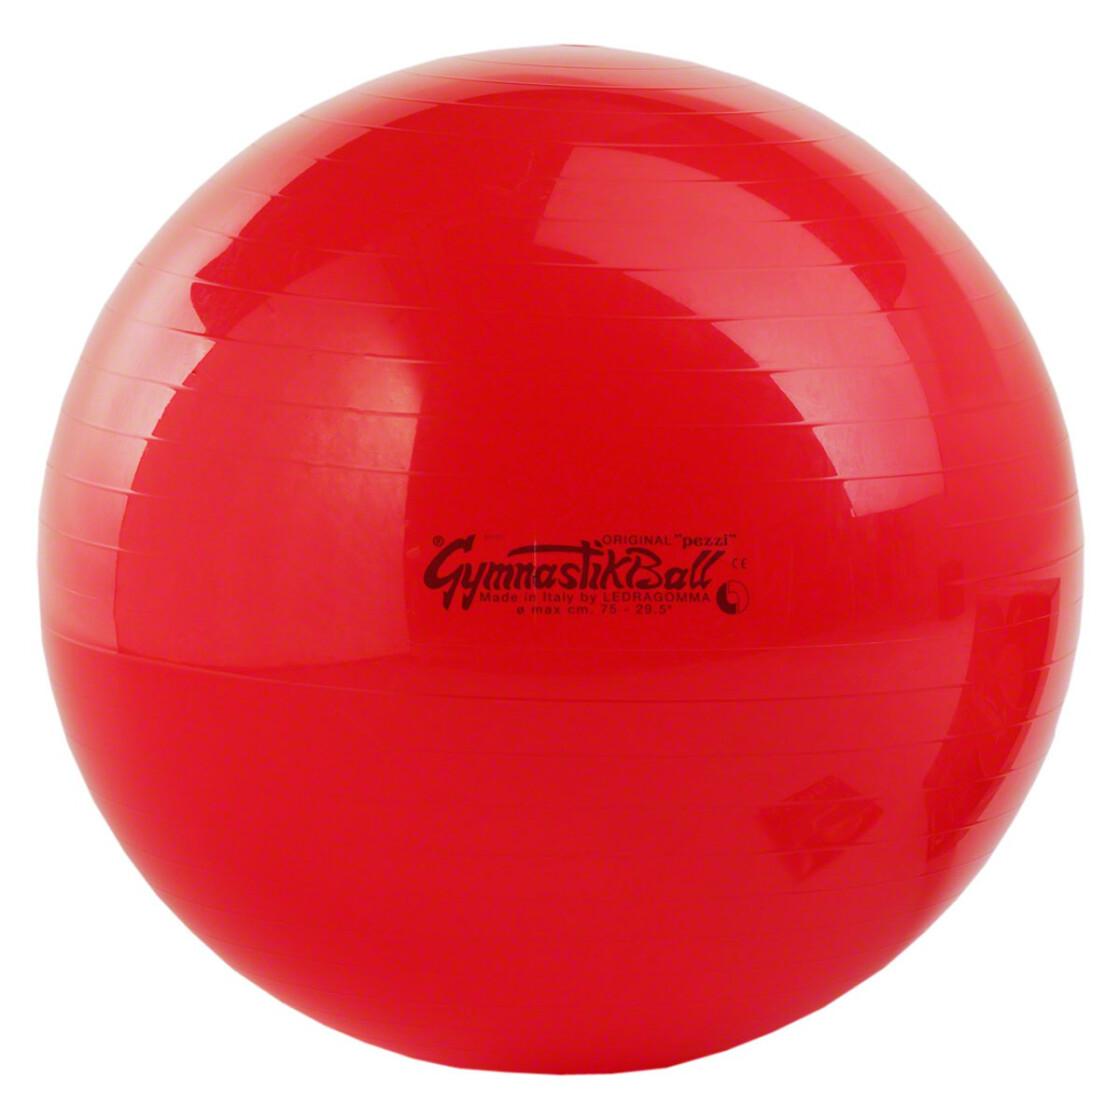 pezzi gymnastikball sitzball 75 cm rot outdoor ausr stung ruck. Black Bedroom Furniture Sets. Home Design Ideas